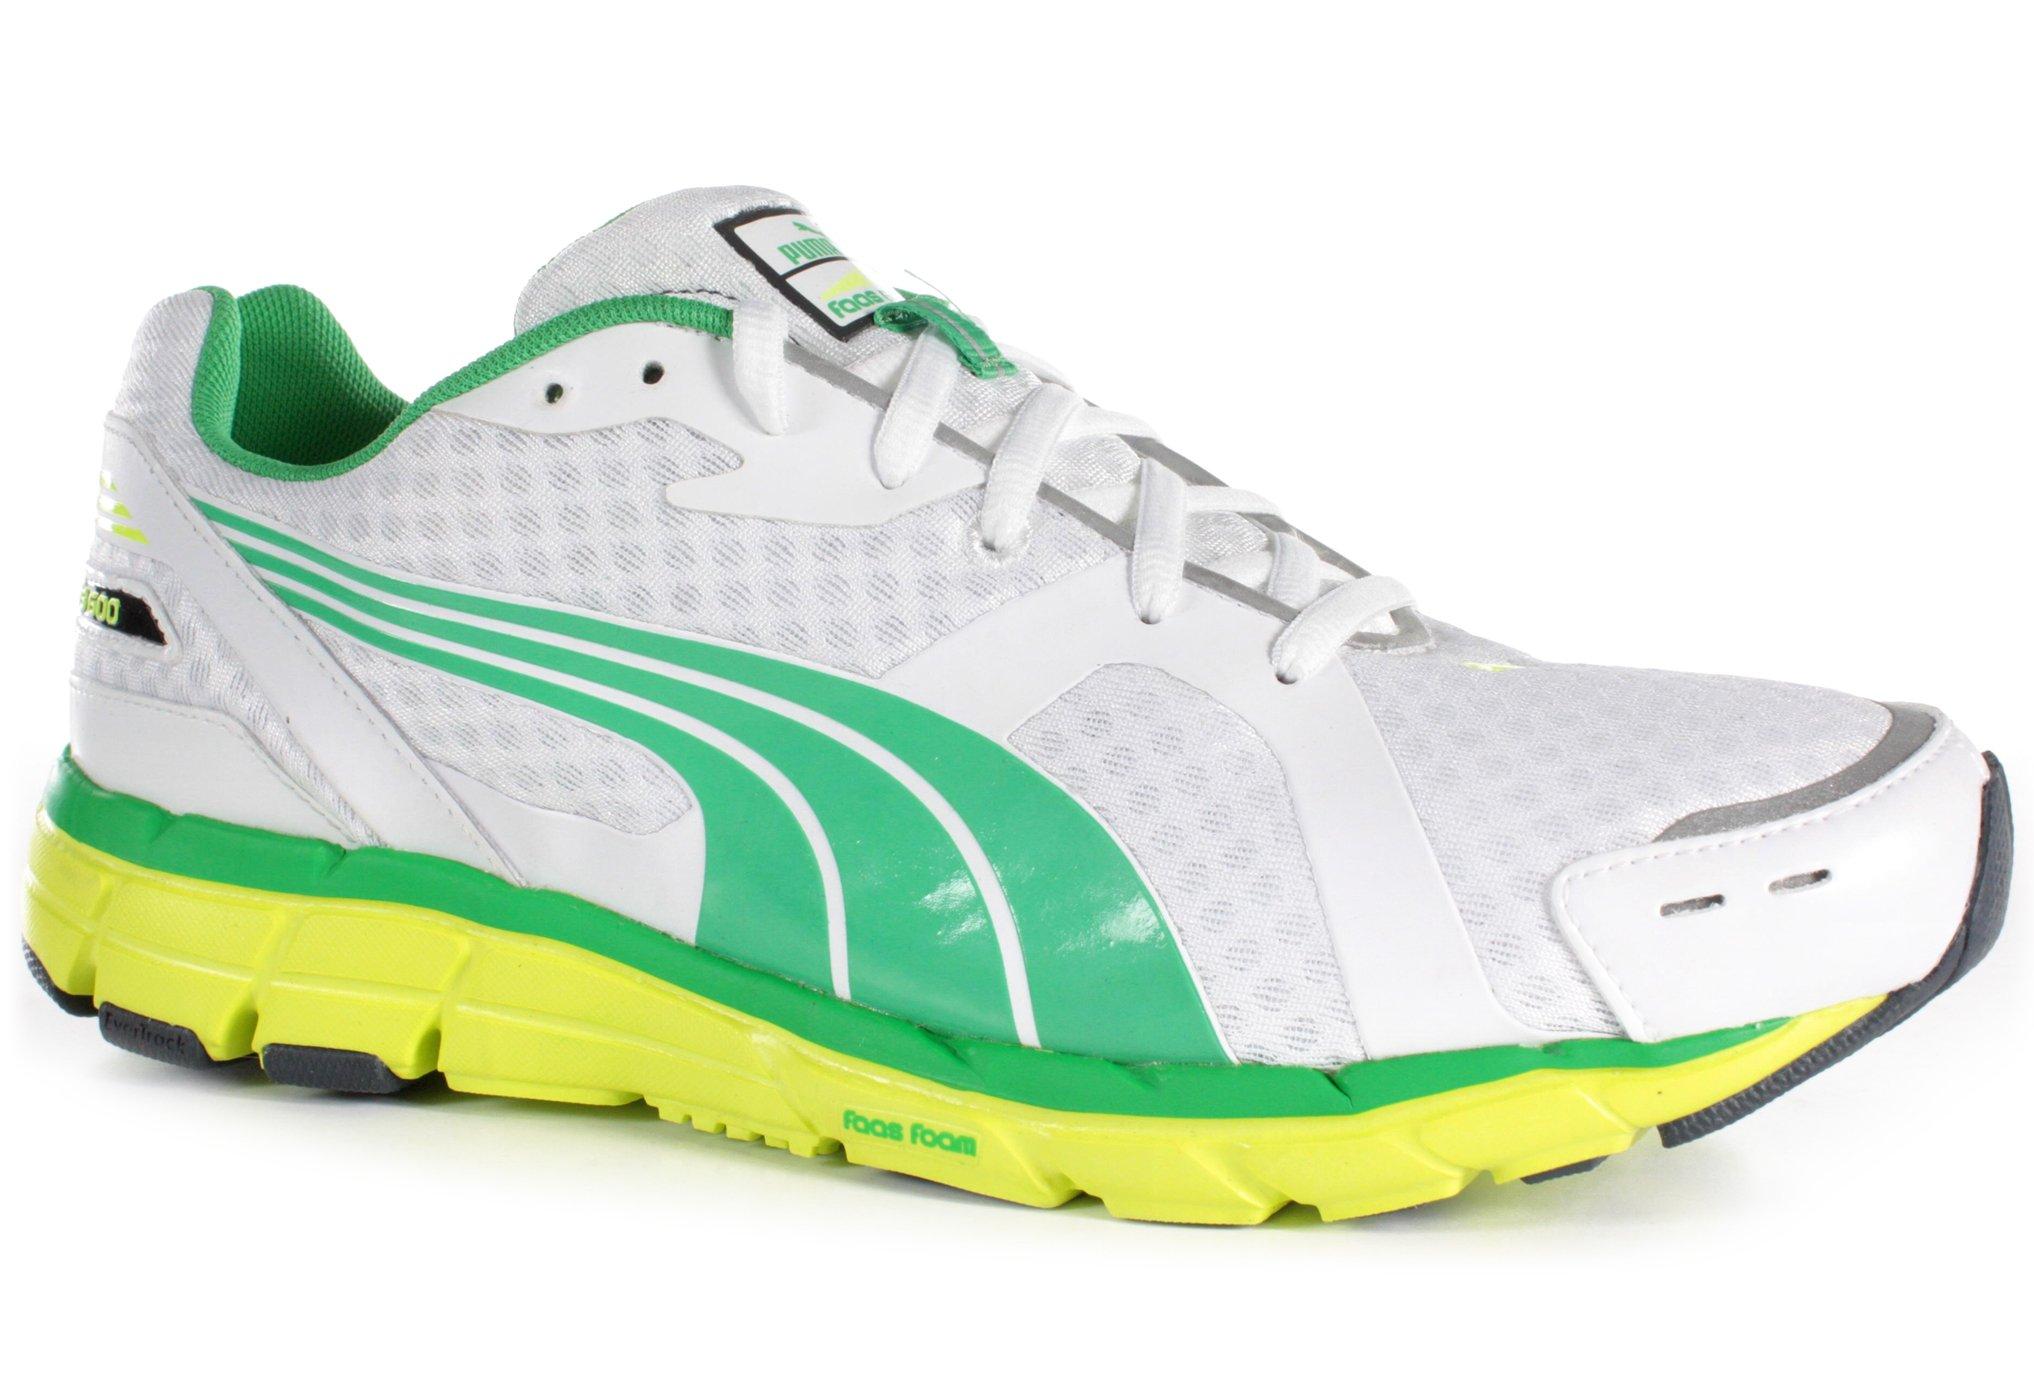 Puma Faas 600 M Chaussures homme